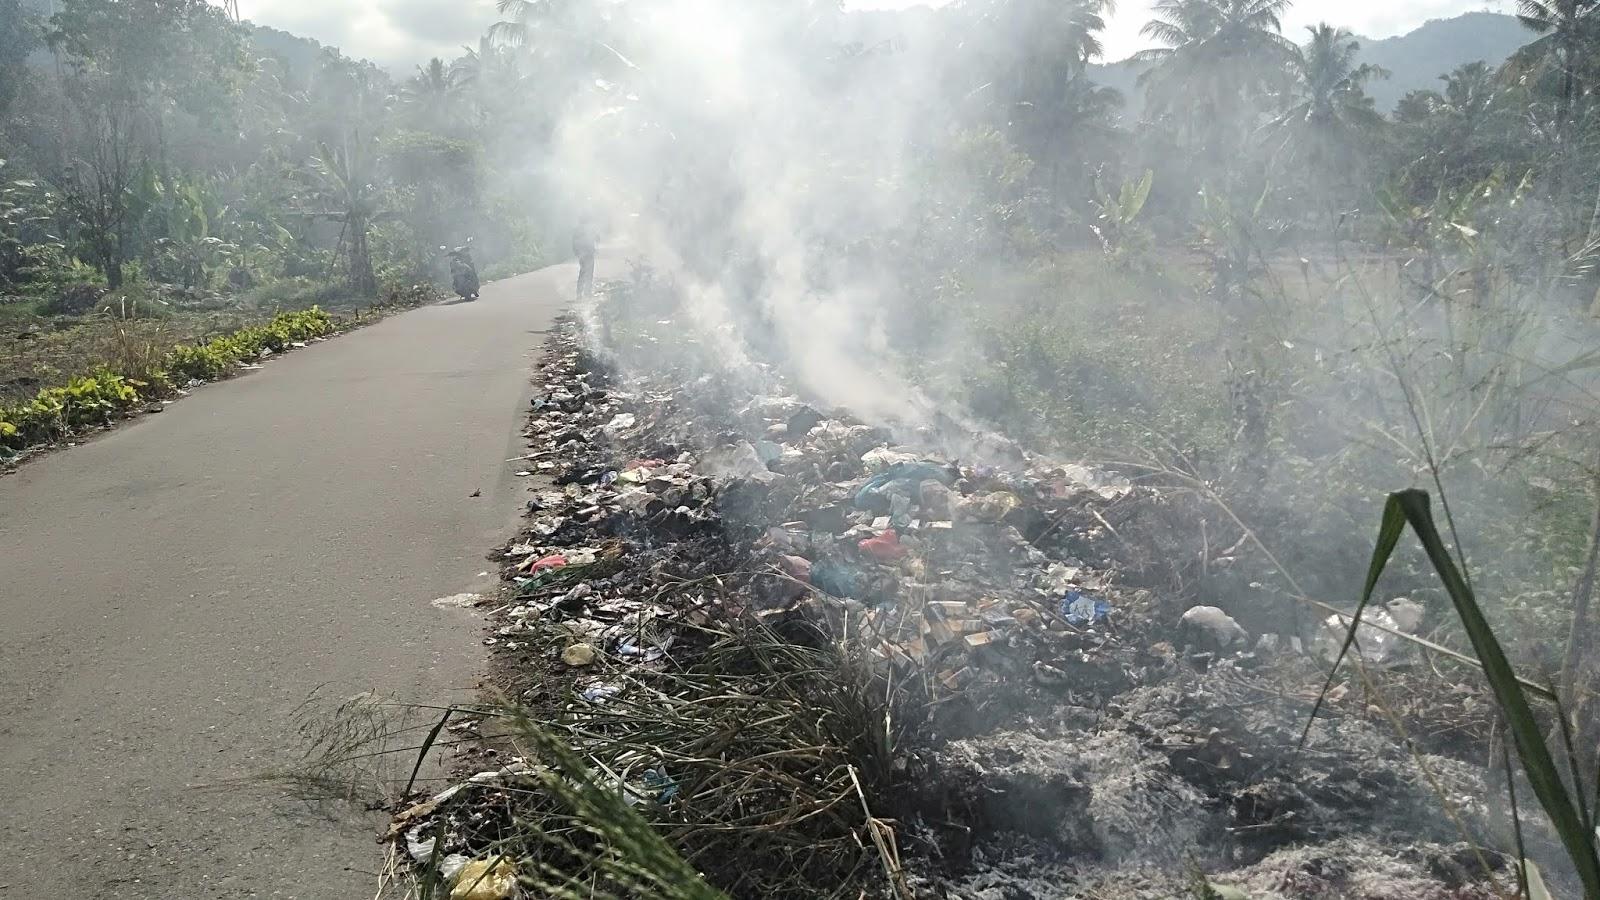 Sampah di Jalan Saropan Sigalangan 70 % Kiriman dari Daerah Lain